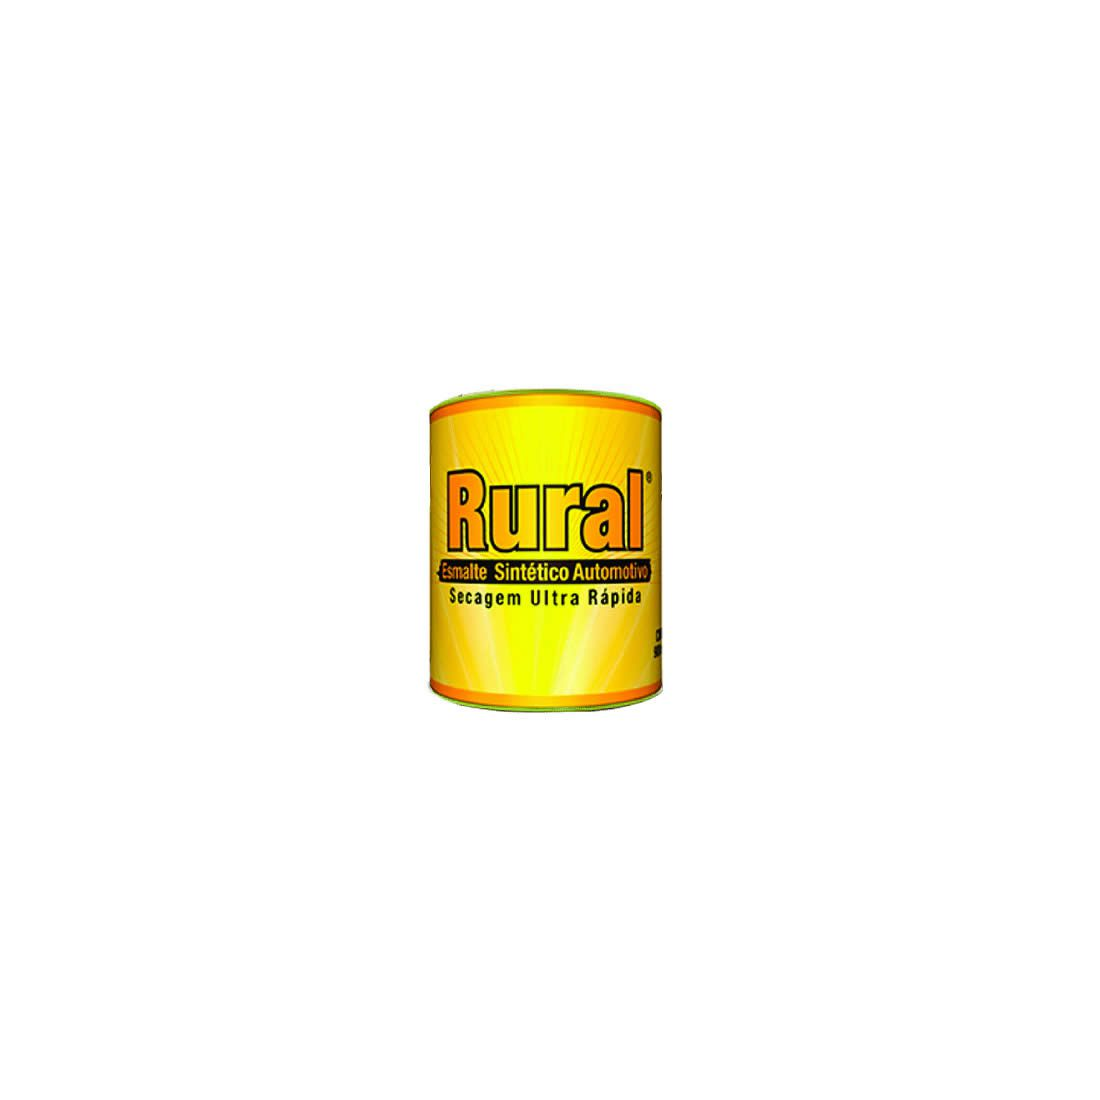 Esmalte Sintético Rural Secagem Ultra Rápido Dourado Laredo Metalizado 900ml